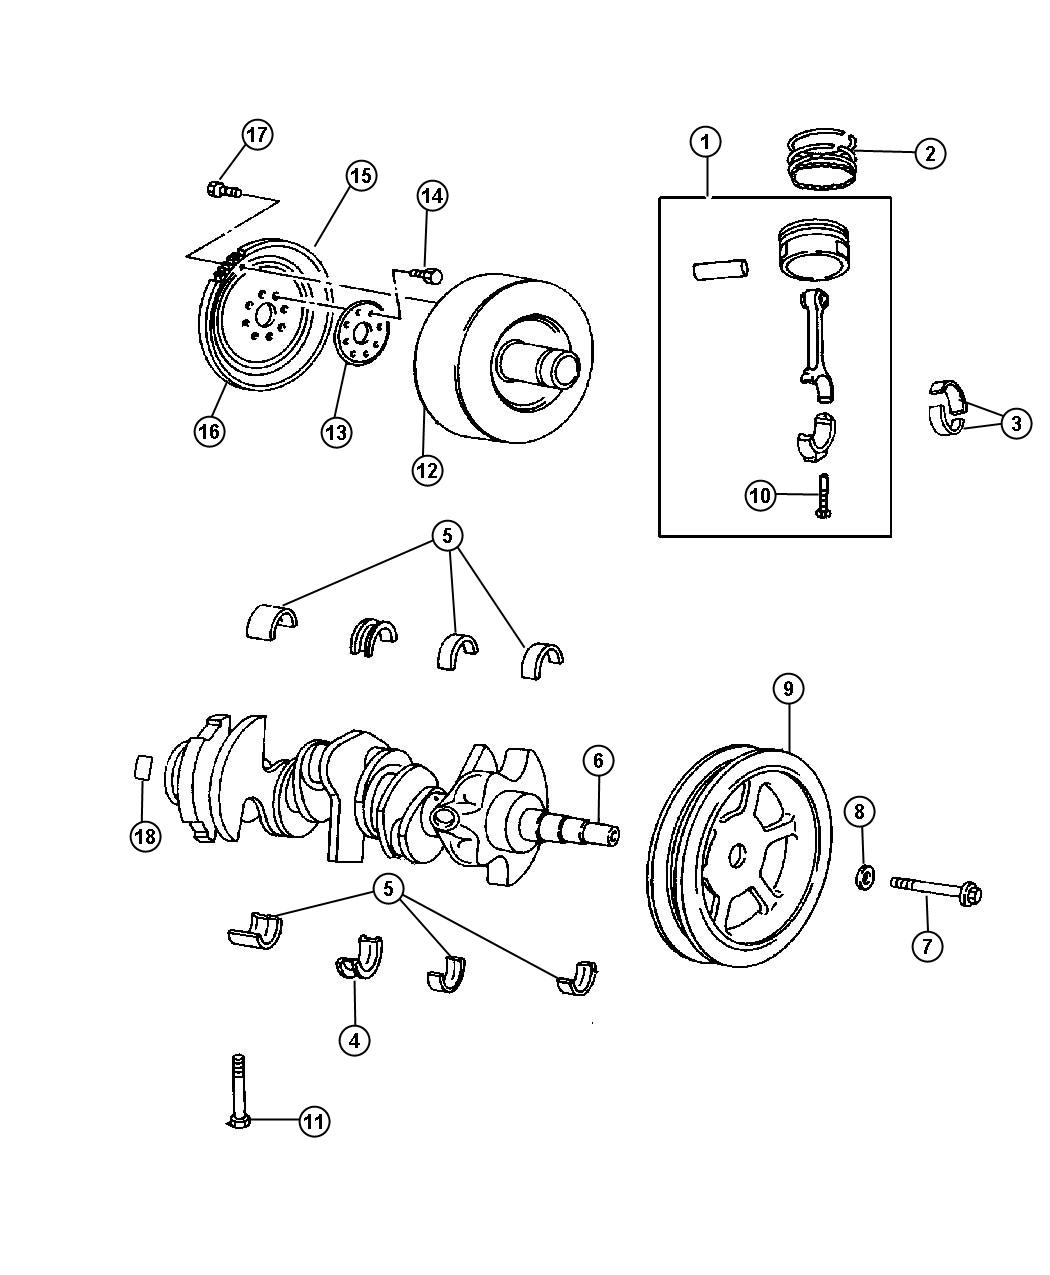 Jeep Wrangler Flywheel Engine Manual Transmission